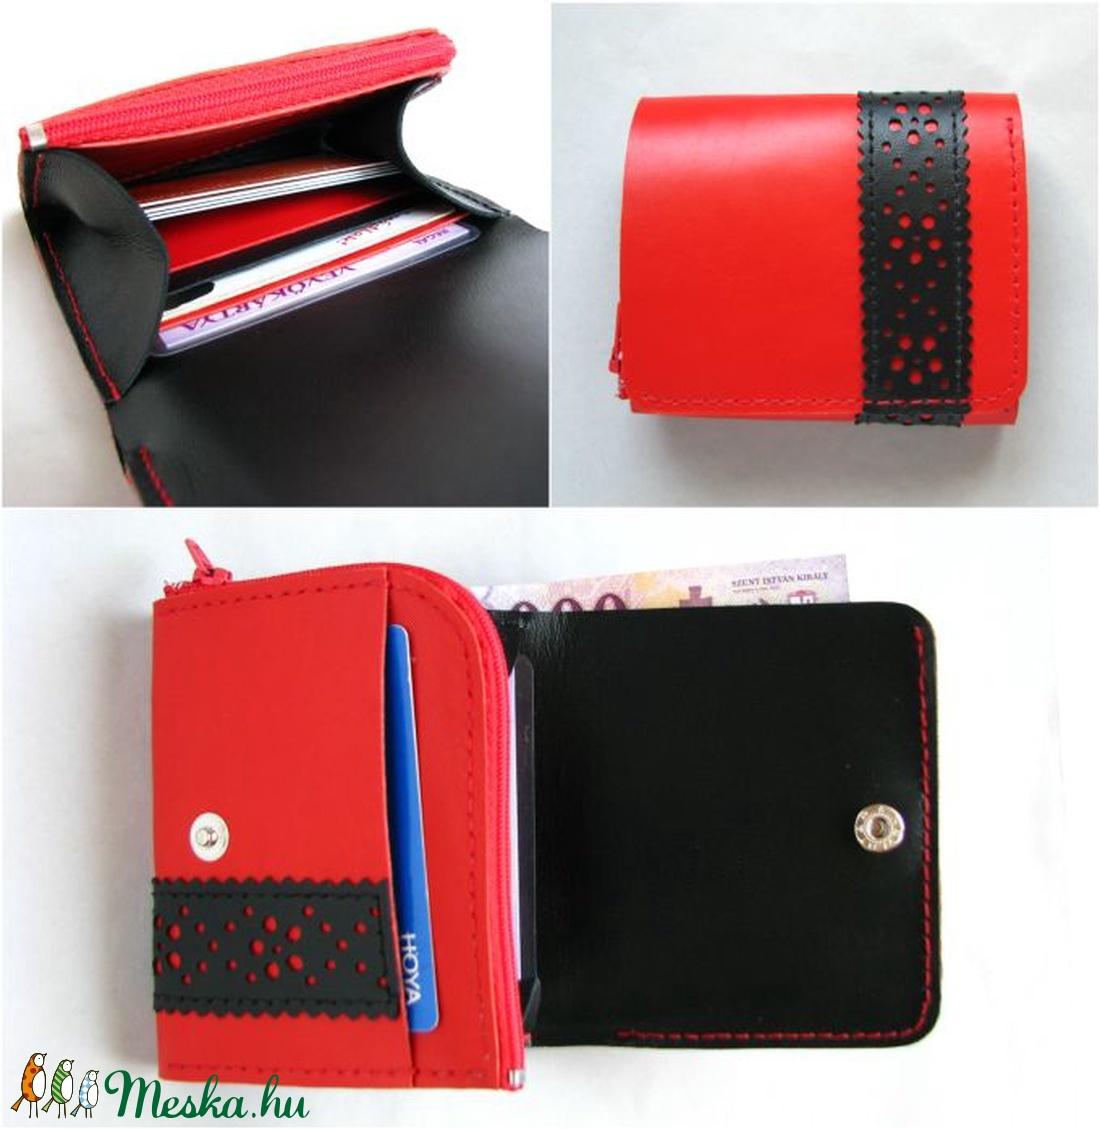 Piros fekete csipkepántos bőr pénztárca (Dettymoon) - Meska.hu af836b2b96